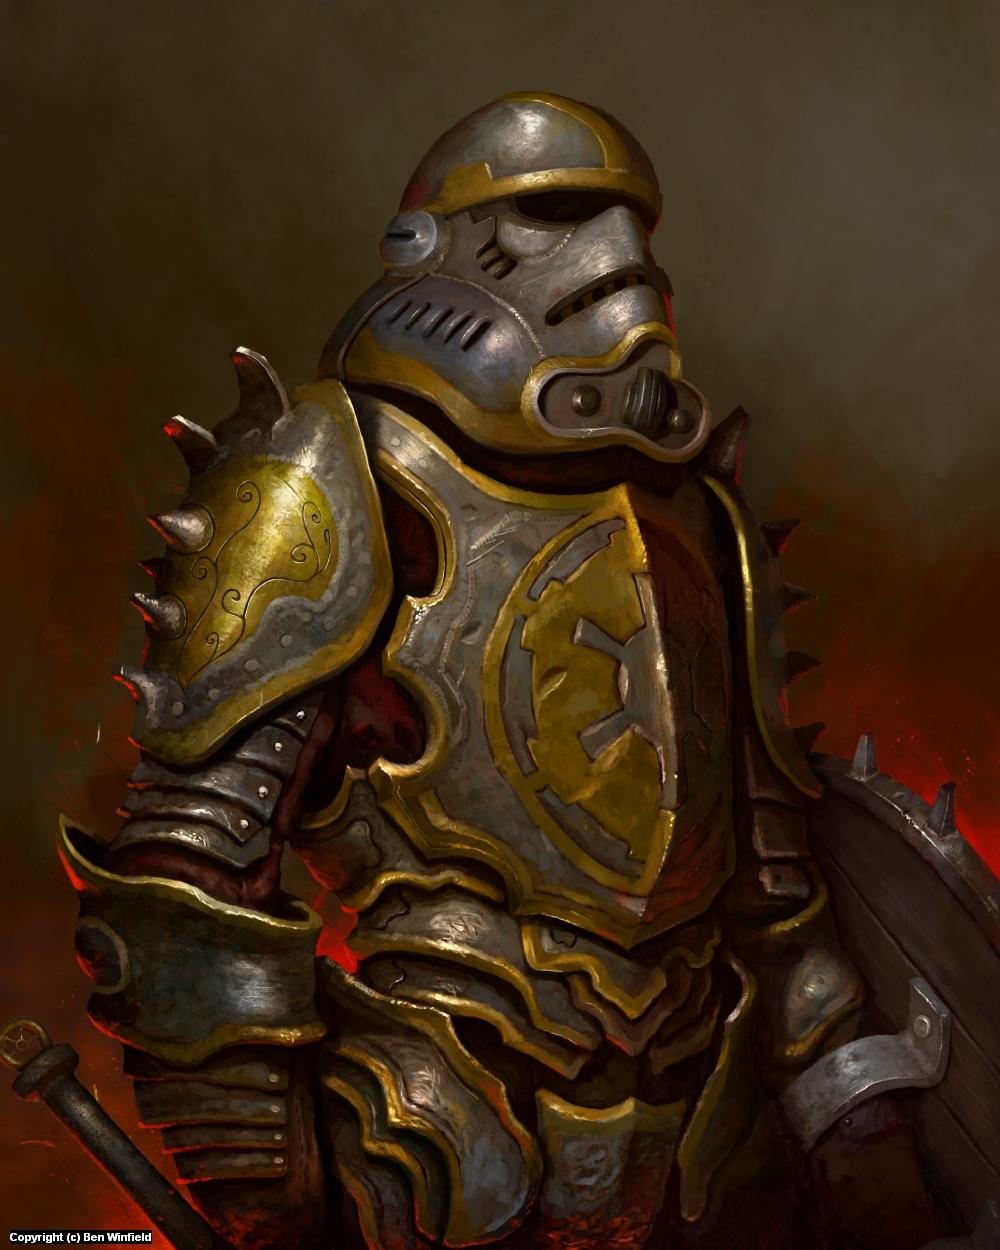 Medieval Stormtrooper Artwork by Ben Winfield